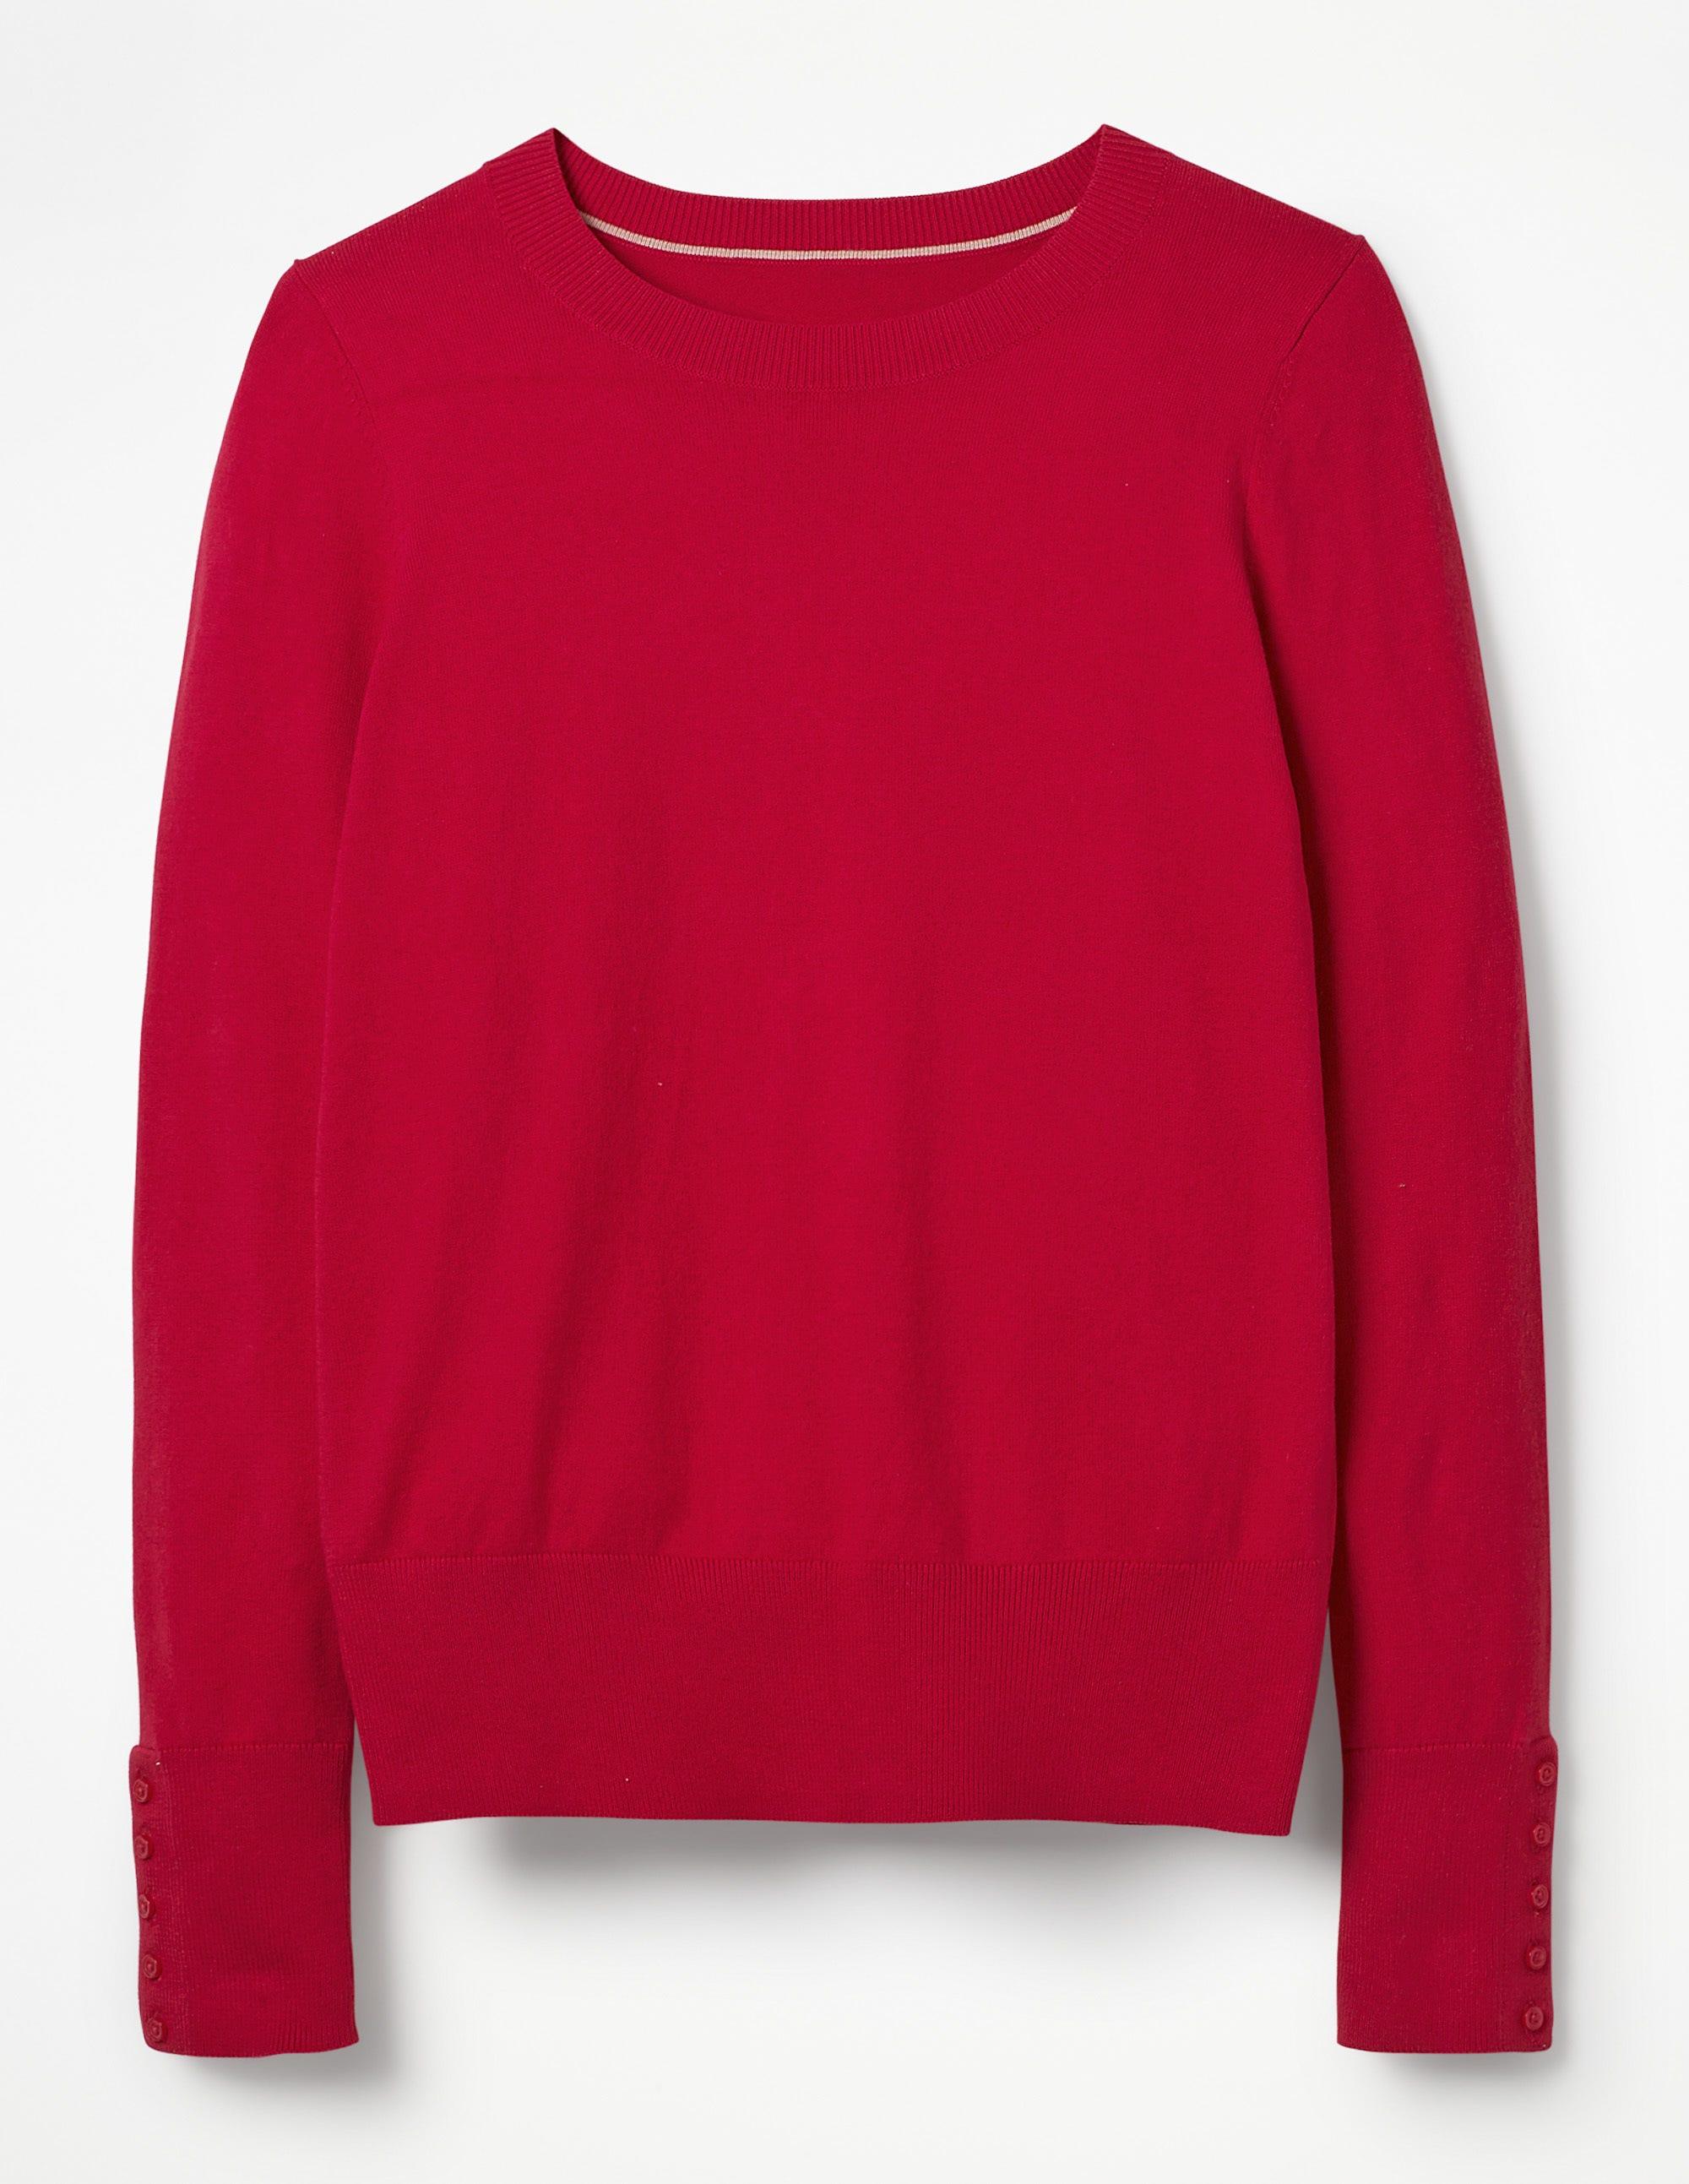 06bd1307c10db8 Tilda Crew Neck Sweater - Black | Boden US